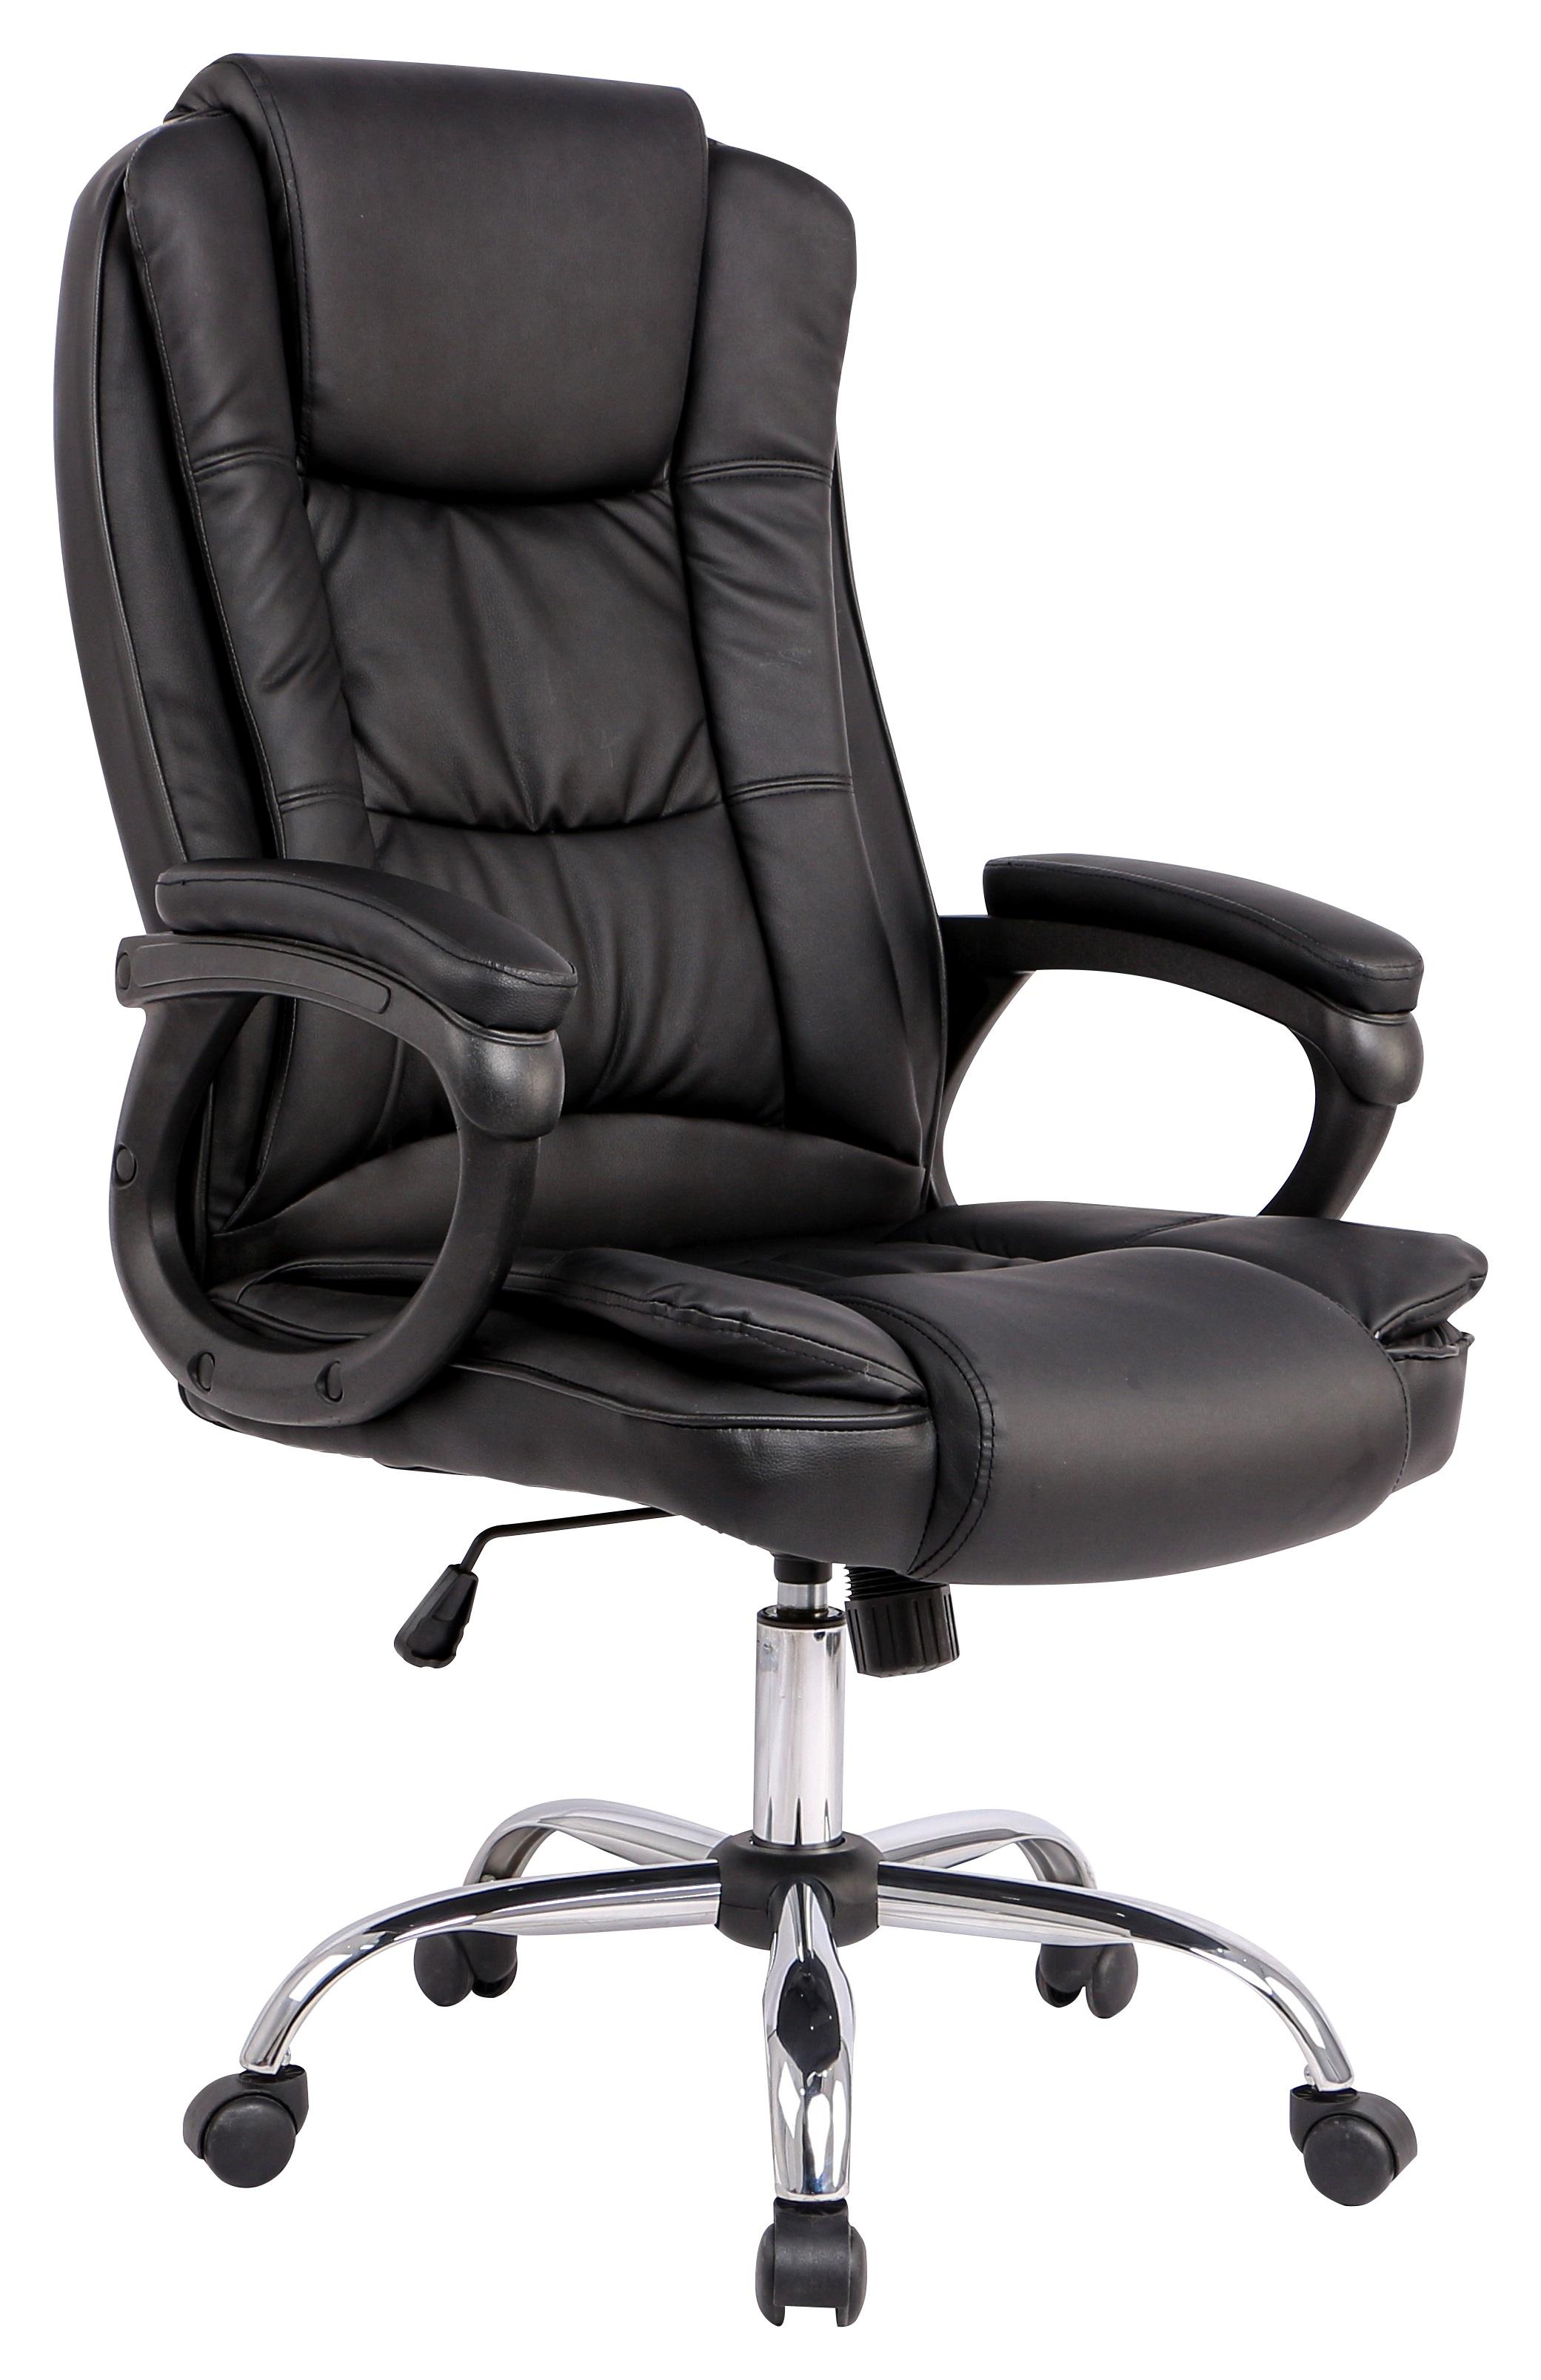 Президентски офис стол Bravas HC-C3351 еко кожа цвят Черен